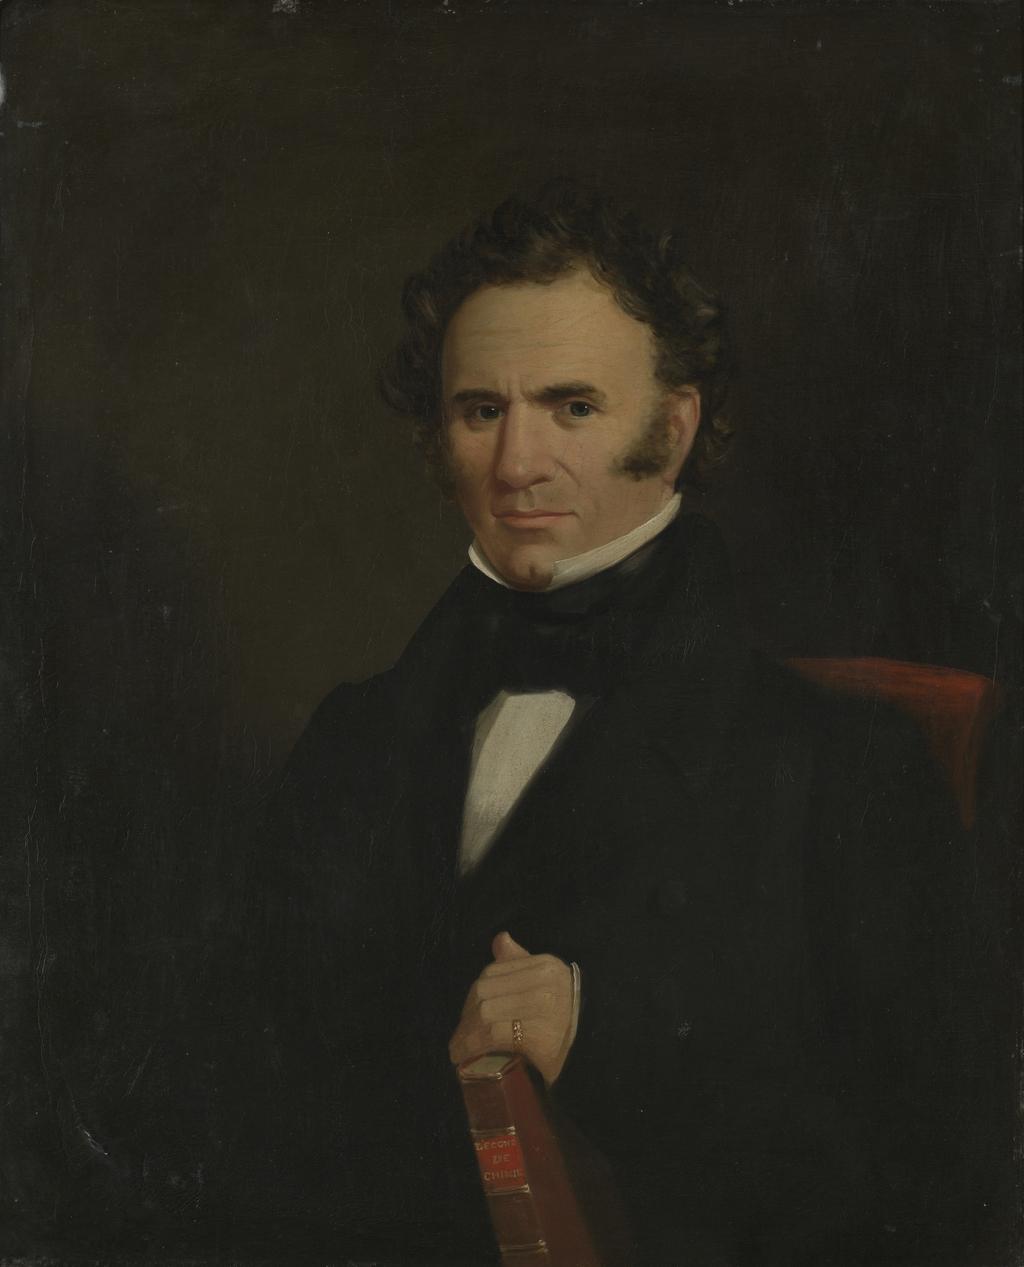 Jean-Baptiste Meilleur